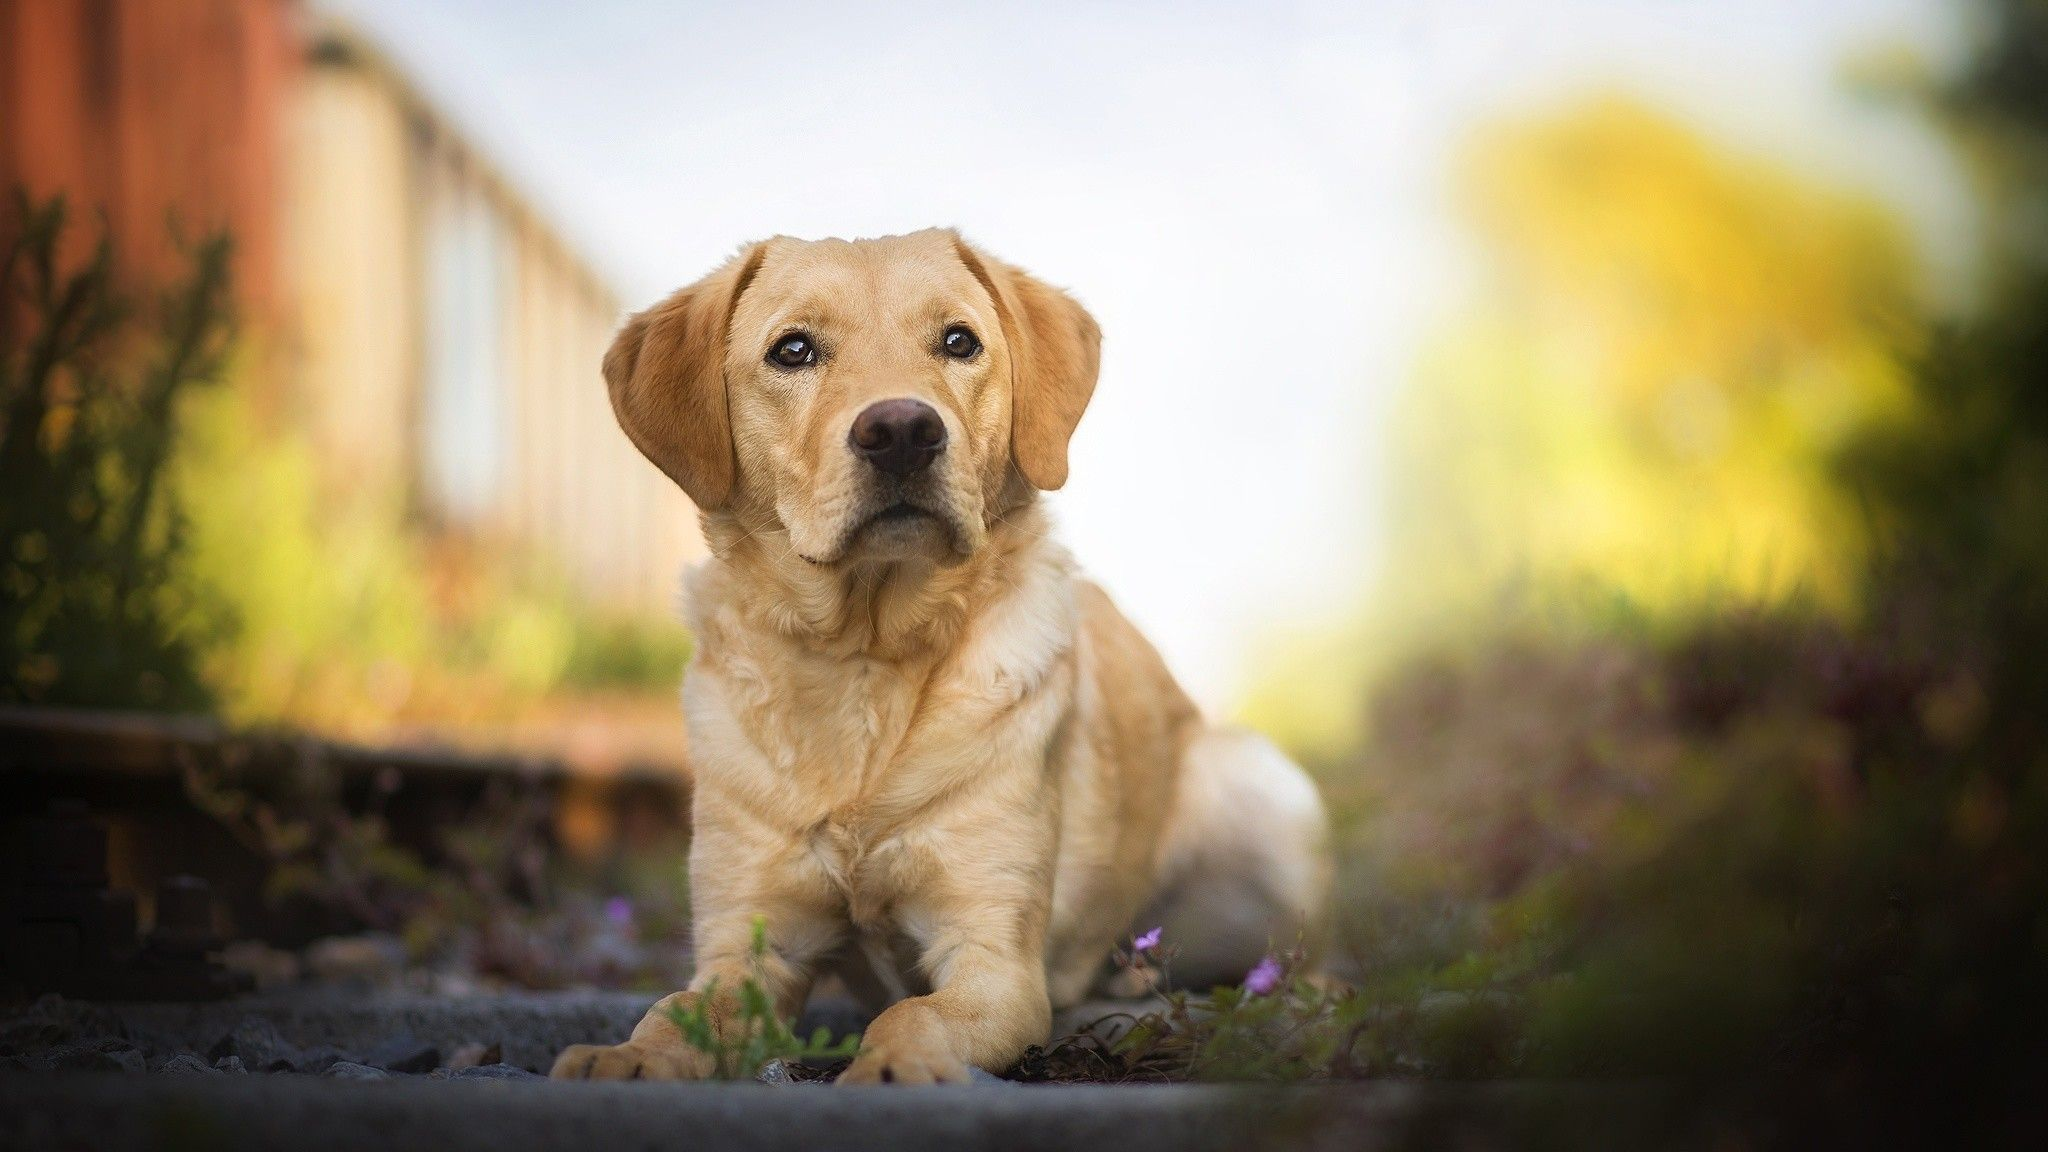 Labrador Retriever Wallpapers Top Free Labrador Retriever Backgrounds Wallpaperaccess